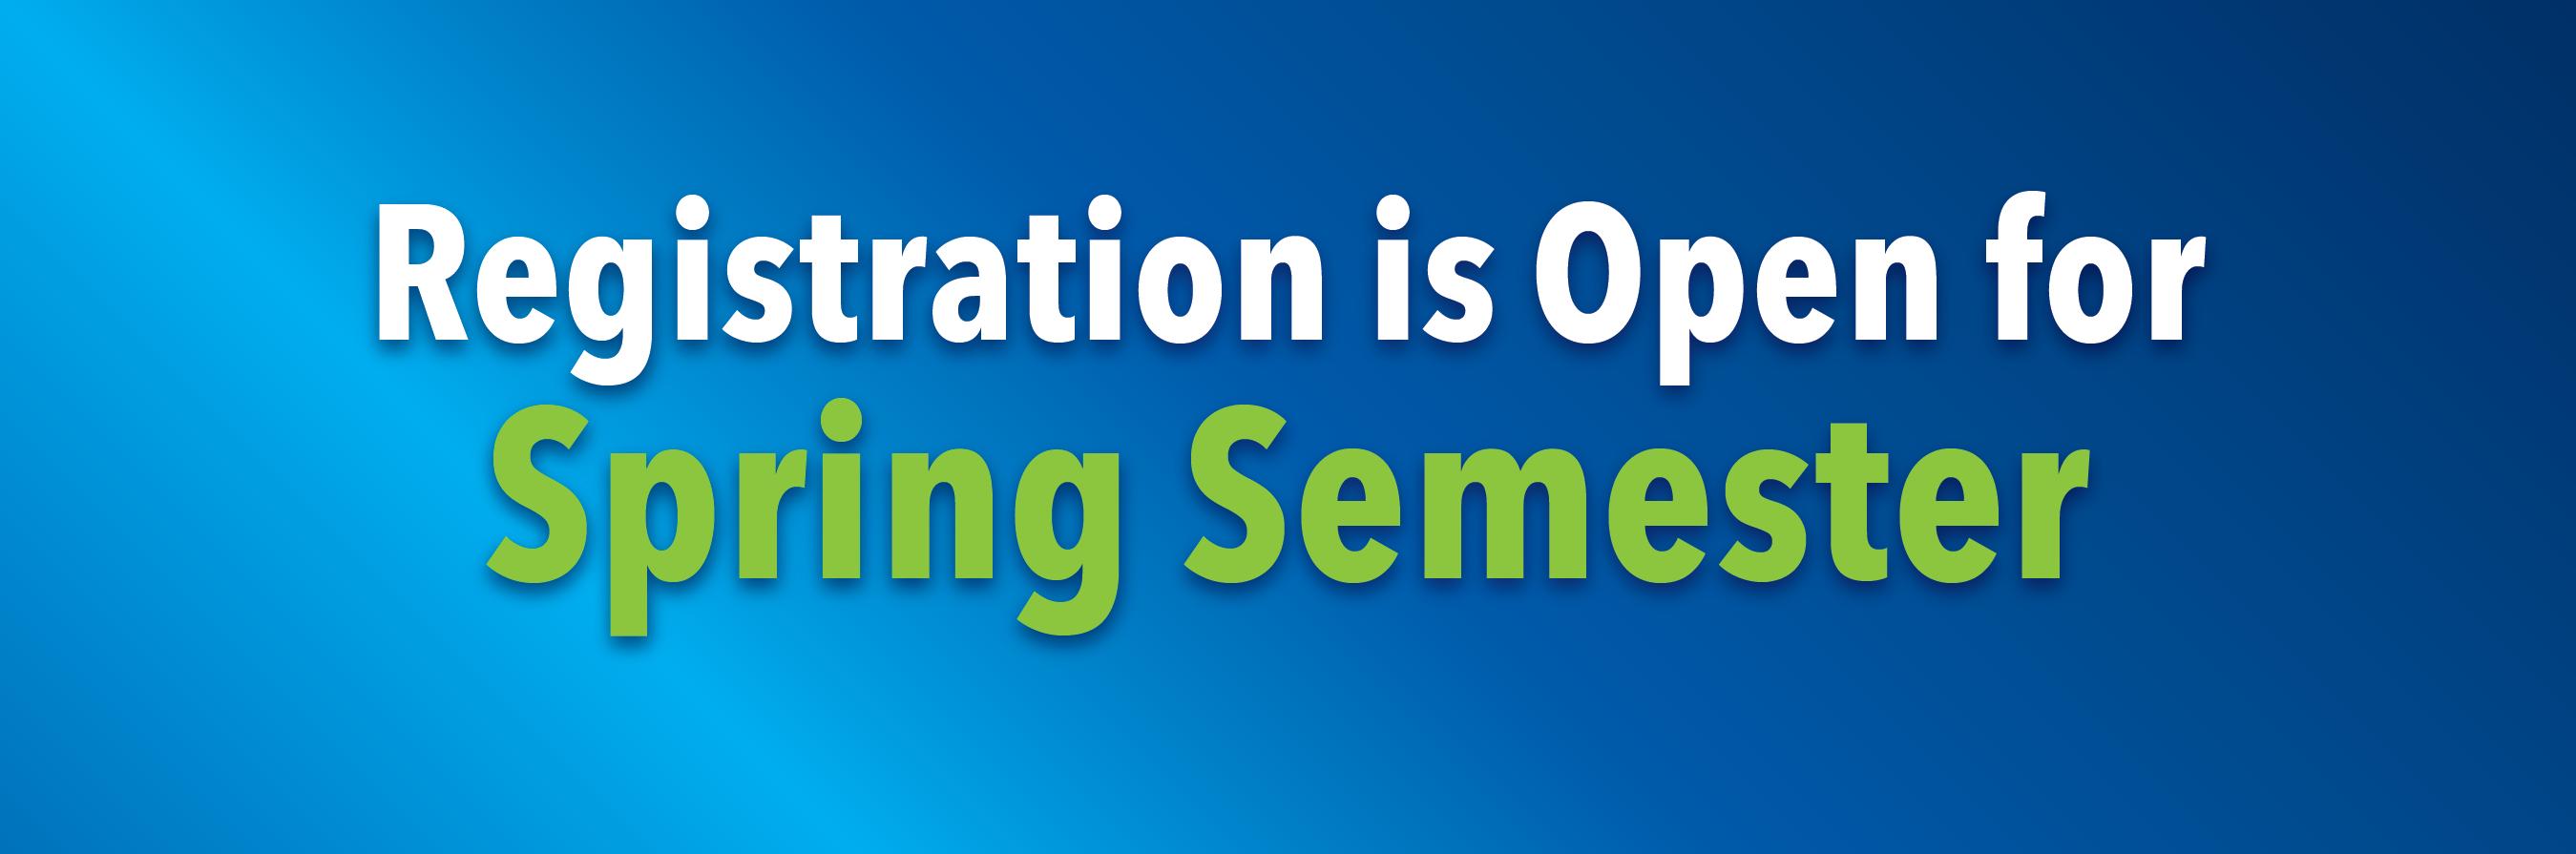 Registration is open for spring semester.